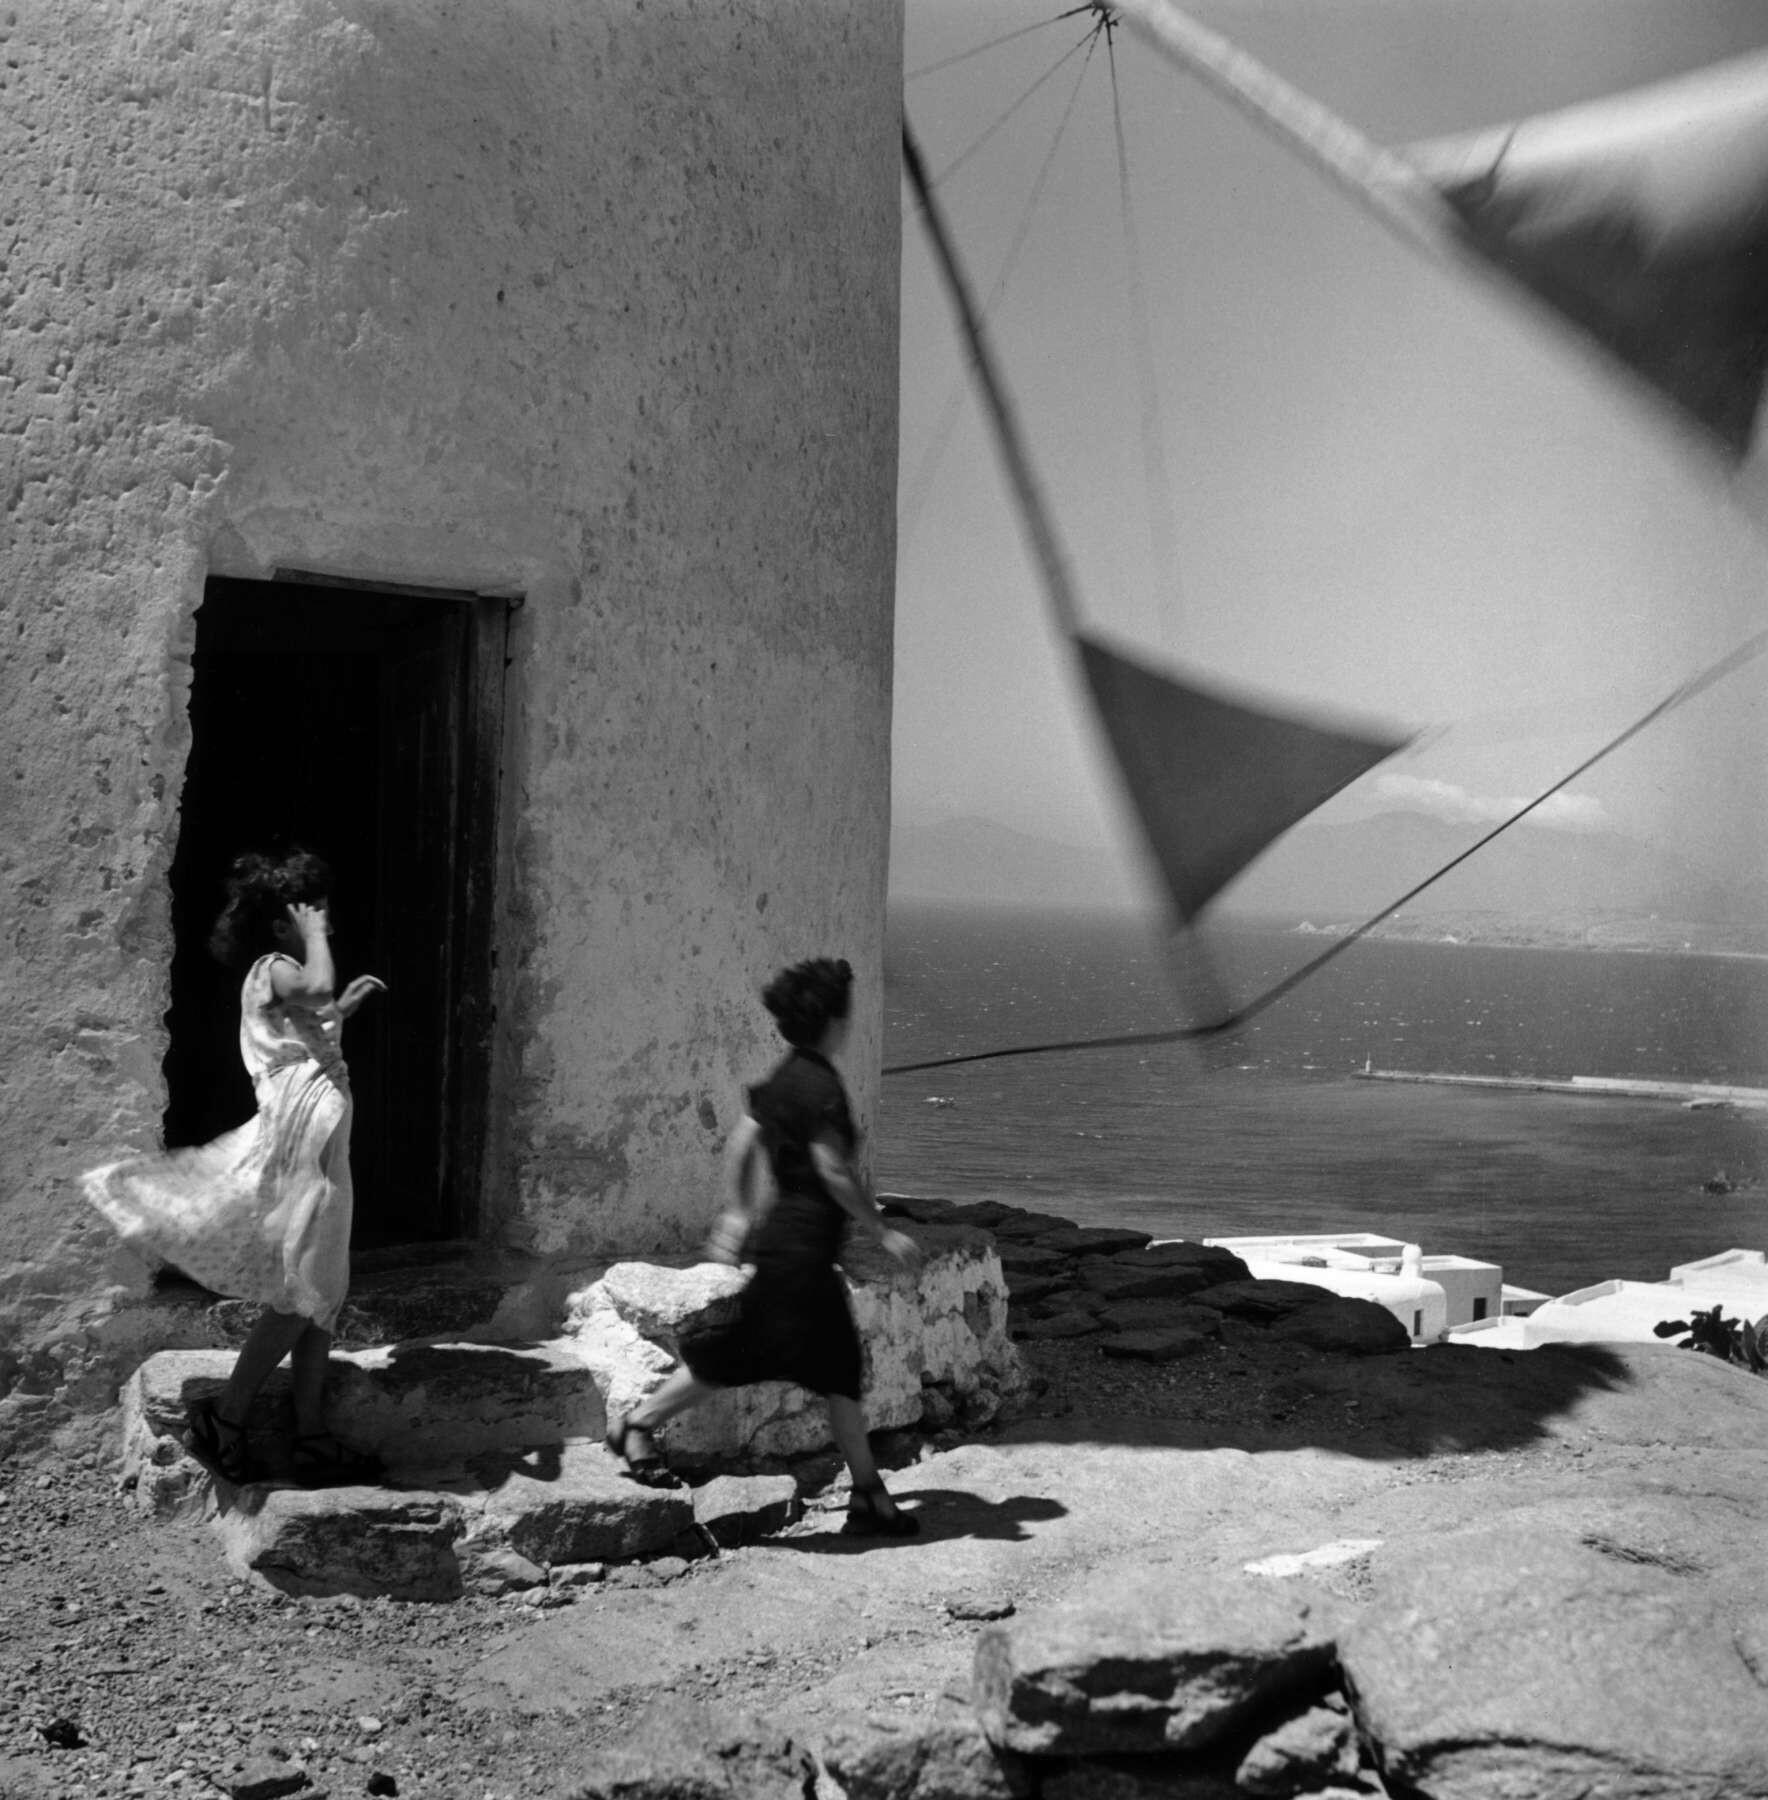 Греция, 1952. Фотограф Эрнст Хаас